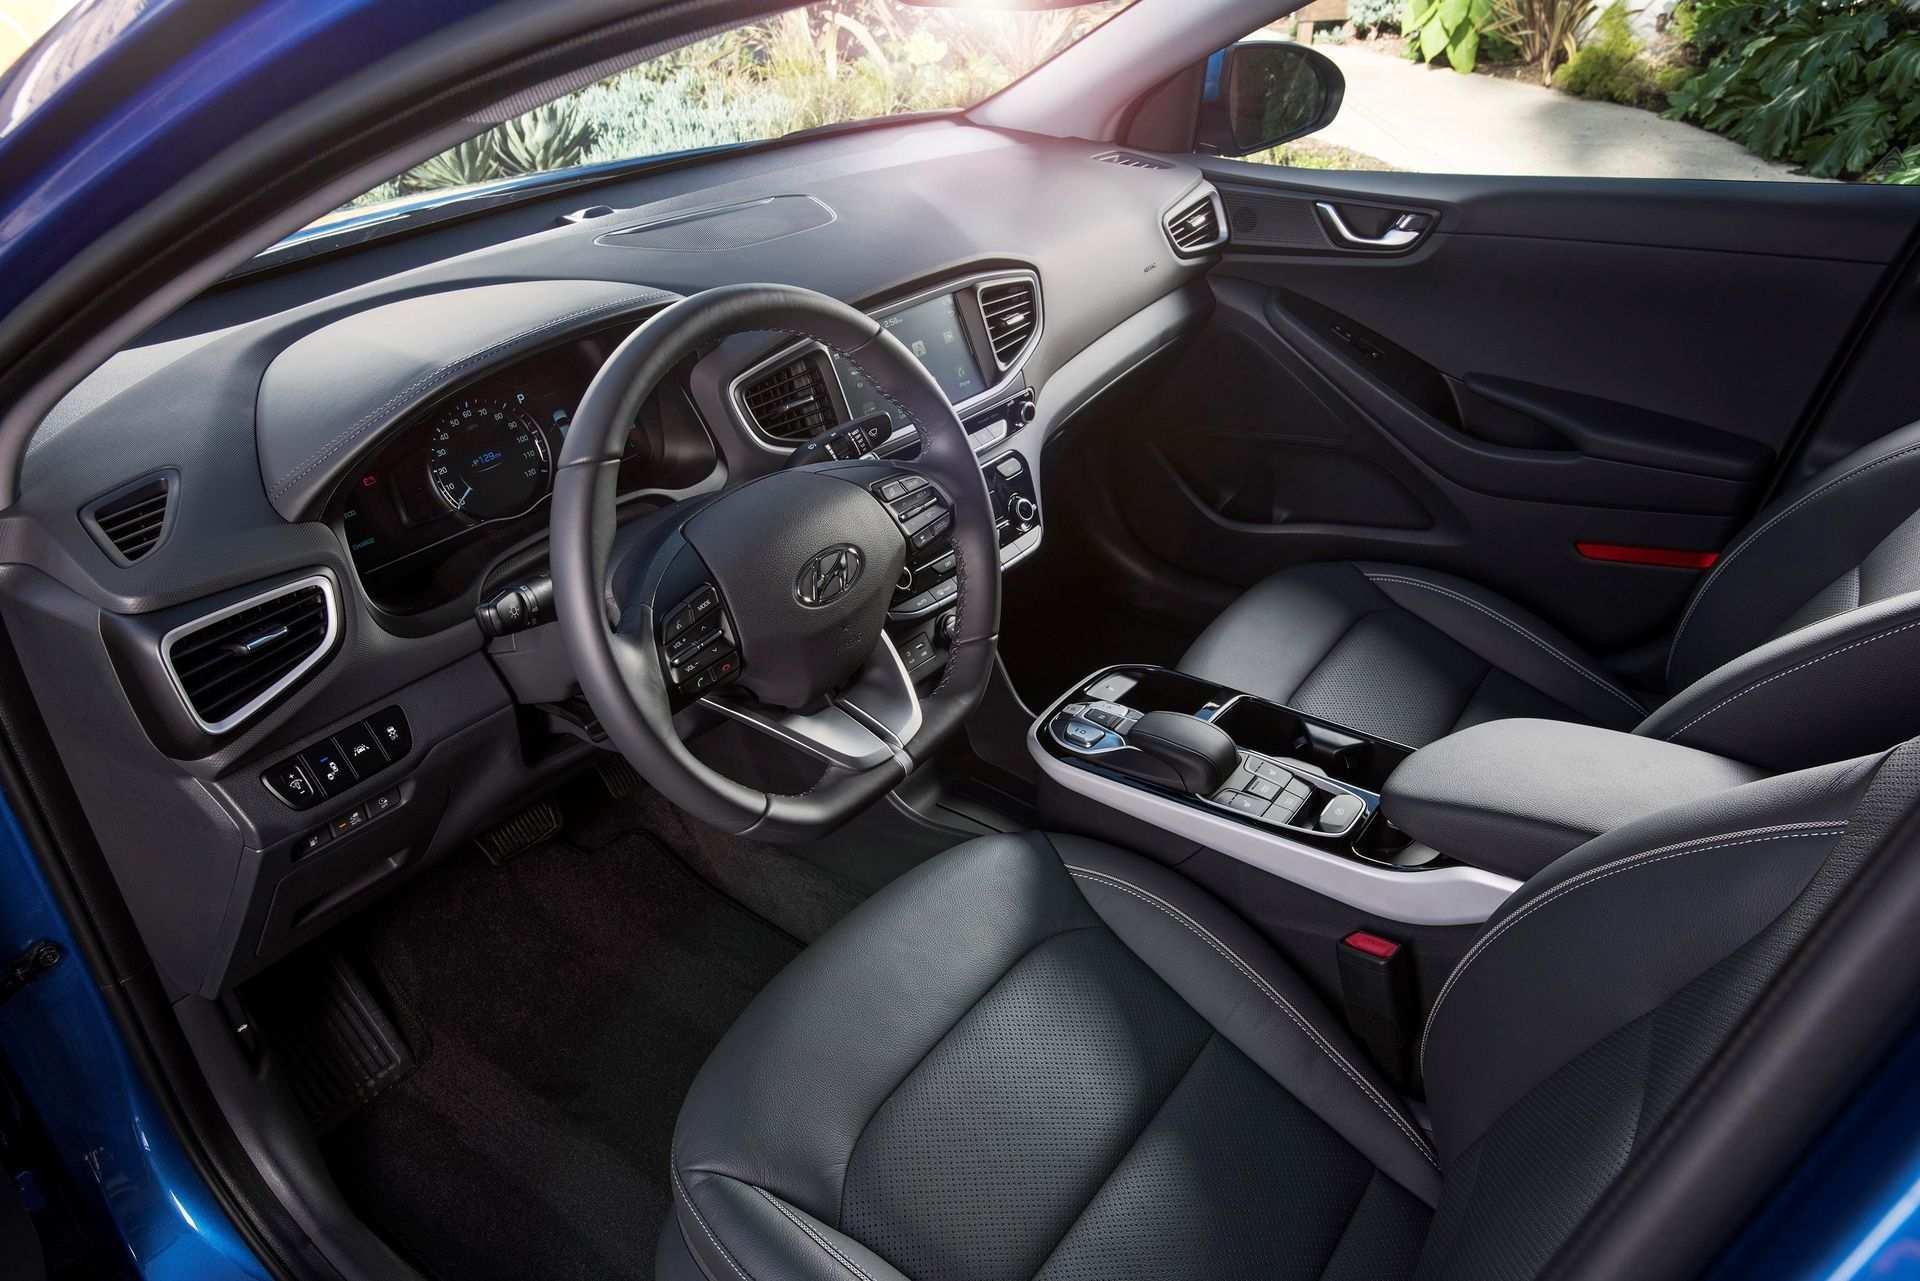 82 All New 2019 Hyundai Ioniq Electric Redesign with 2019 Hyundai Ioniq Electric